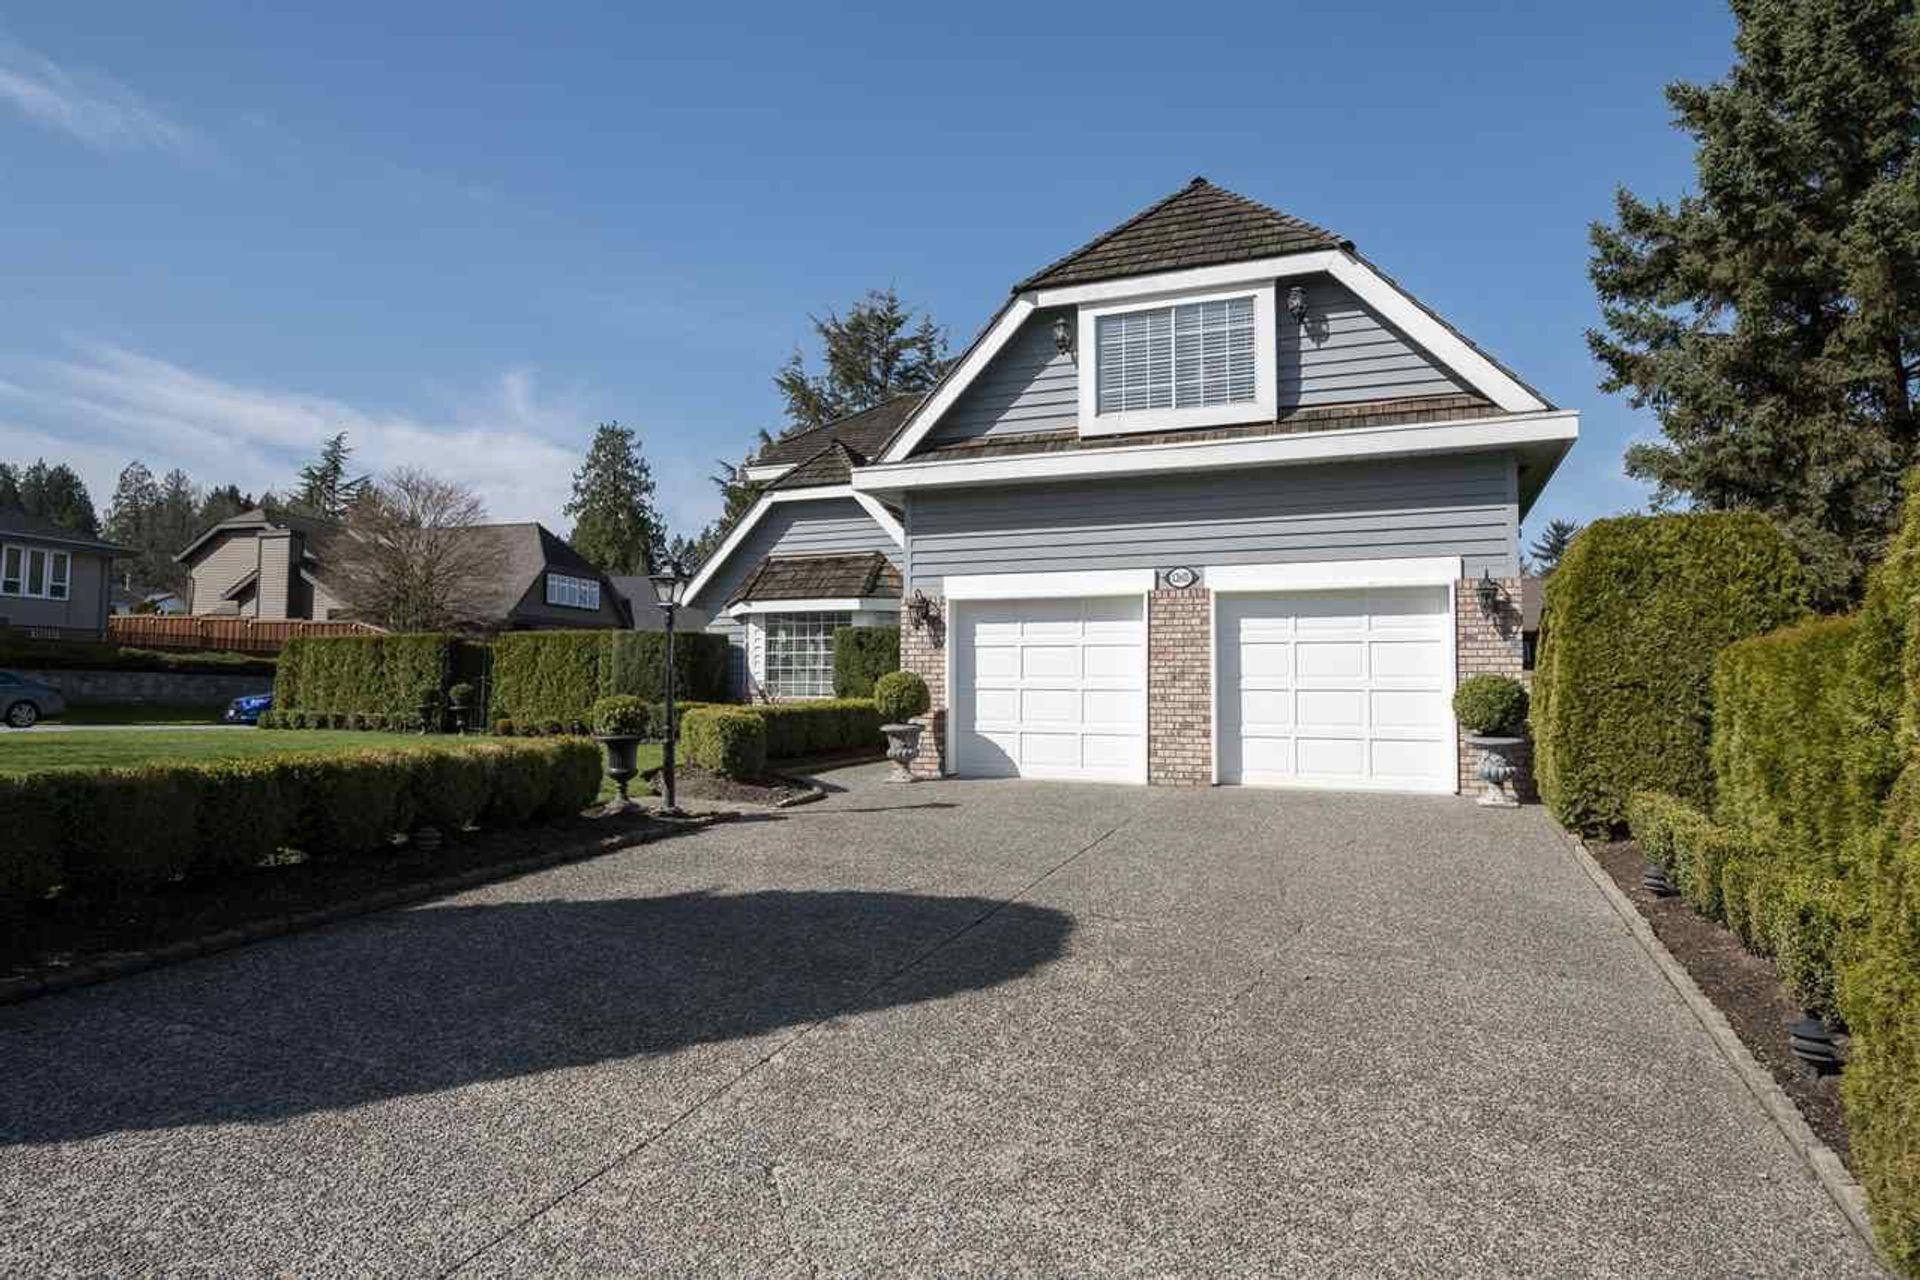 12603-215-street-west-central-maple-ridge-28 at 12603 215 Street, West Central, Maple Ridge